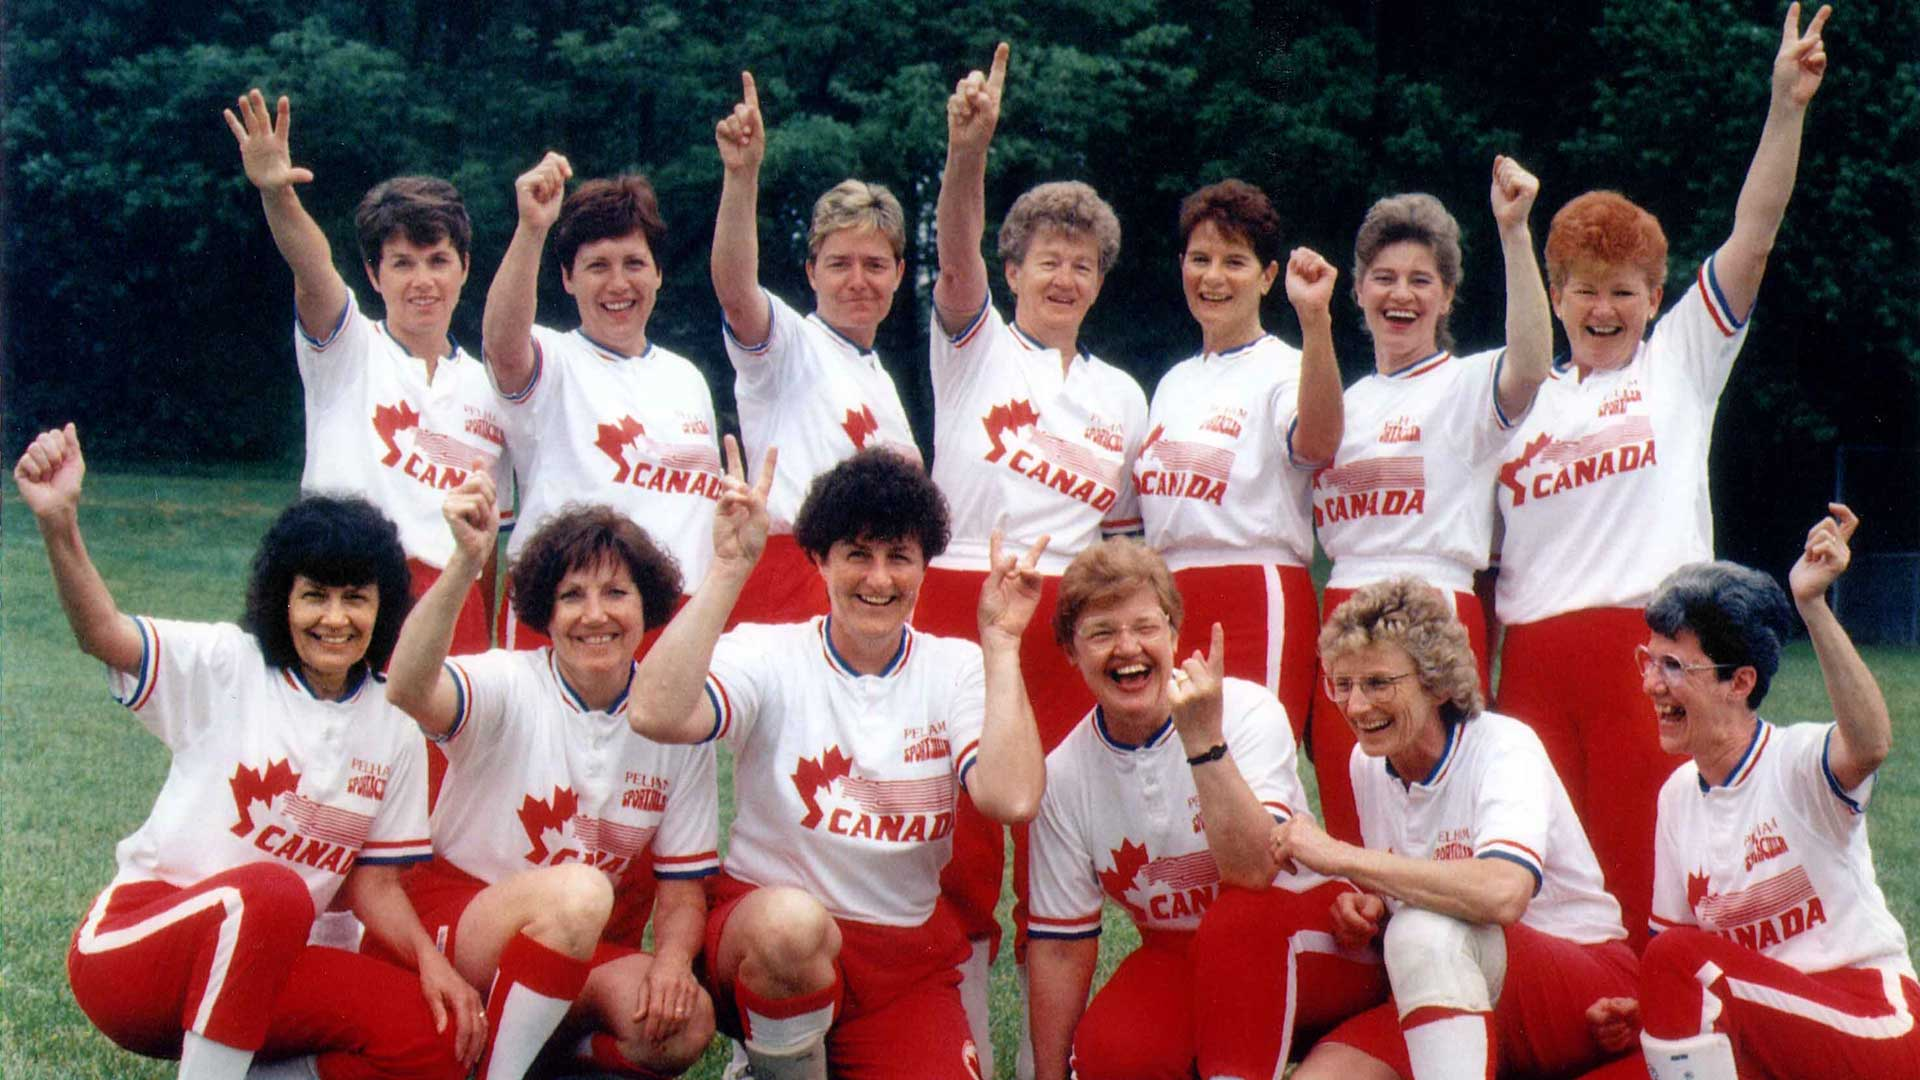 Extrait - Baseball Girls - Lois Siegel